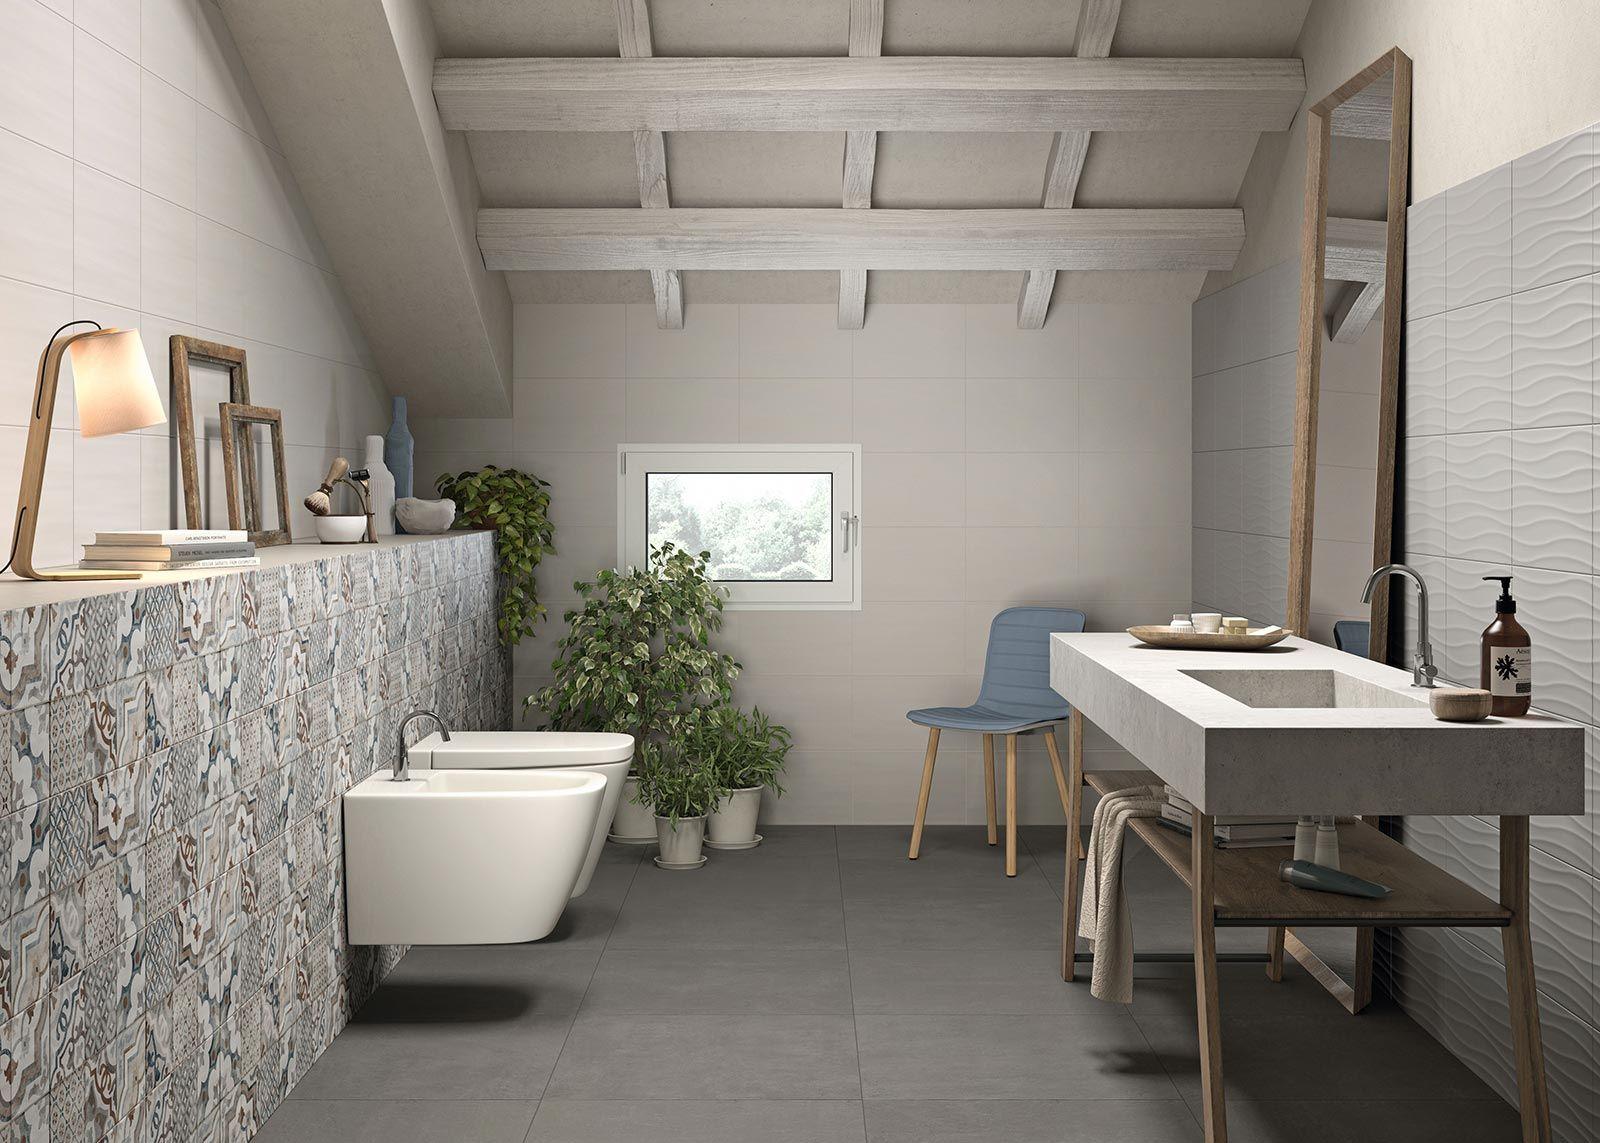 Favorito White Tiles: view the collections | Marazzi | salle de bain  QJ94